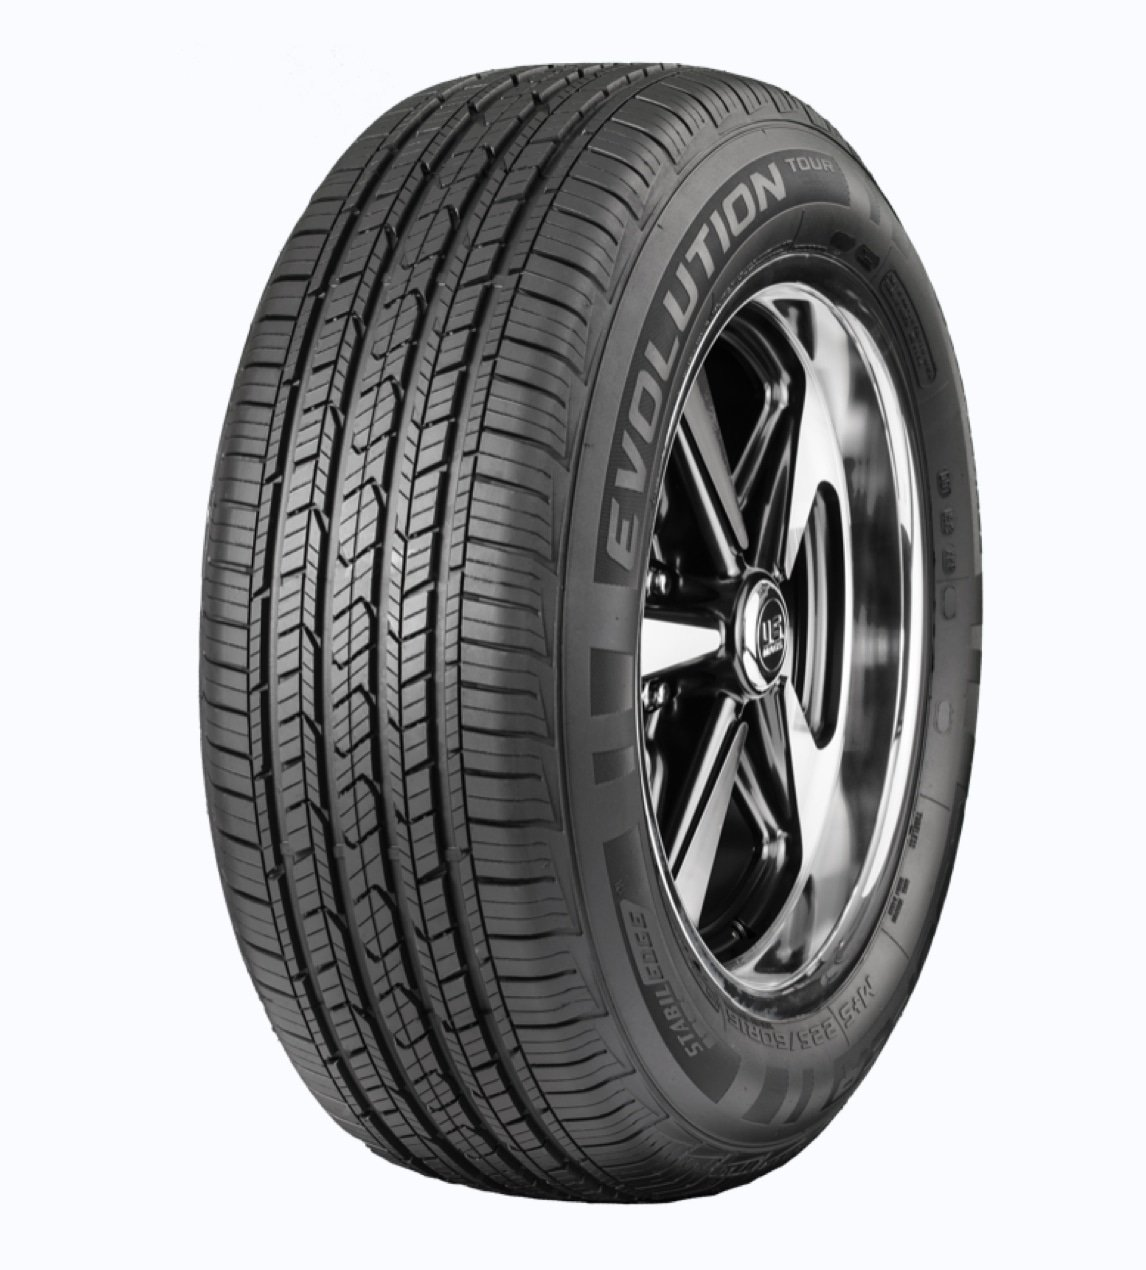 Set of 2 Cooper Evolution Tour 225/50R17 94T tires  BRAND NEW